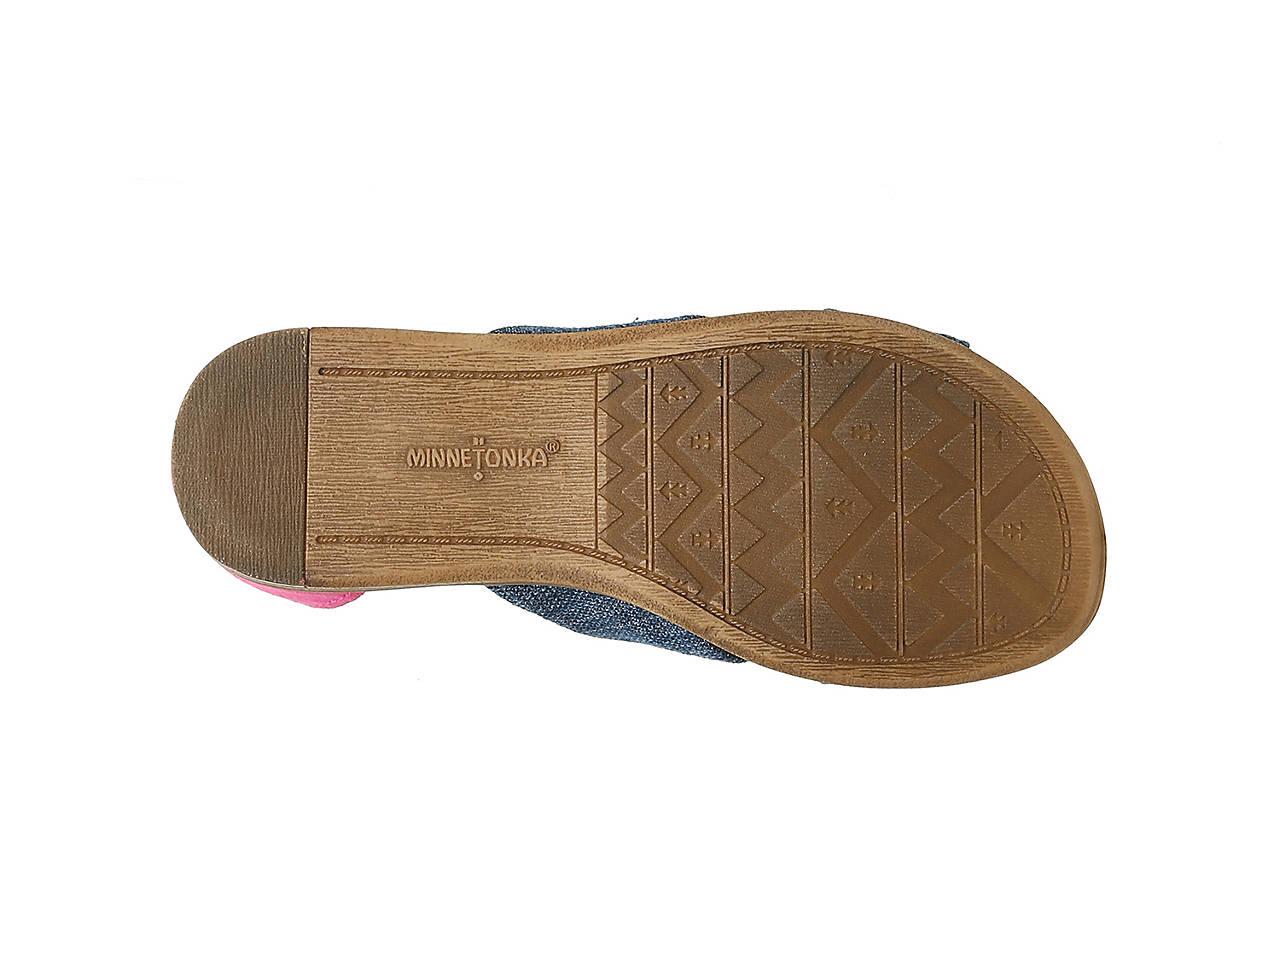 3f8859dce94 Minnetonka Etta Toddler   Youth Sandal Kids Shoes